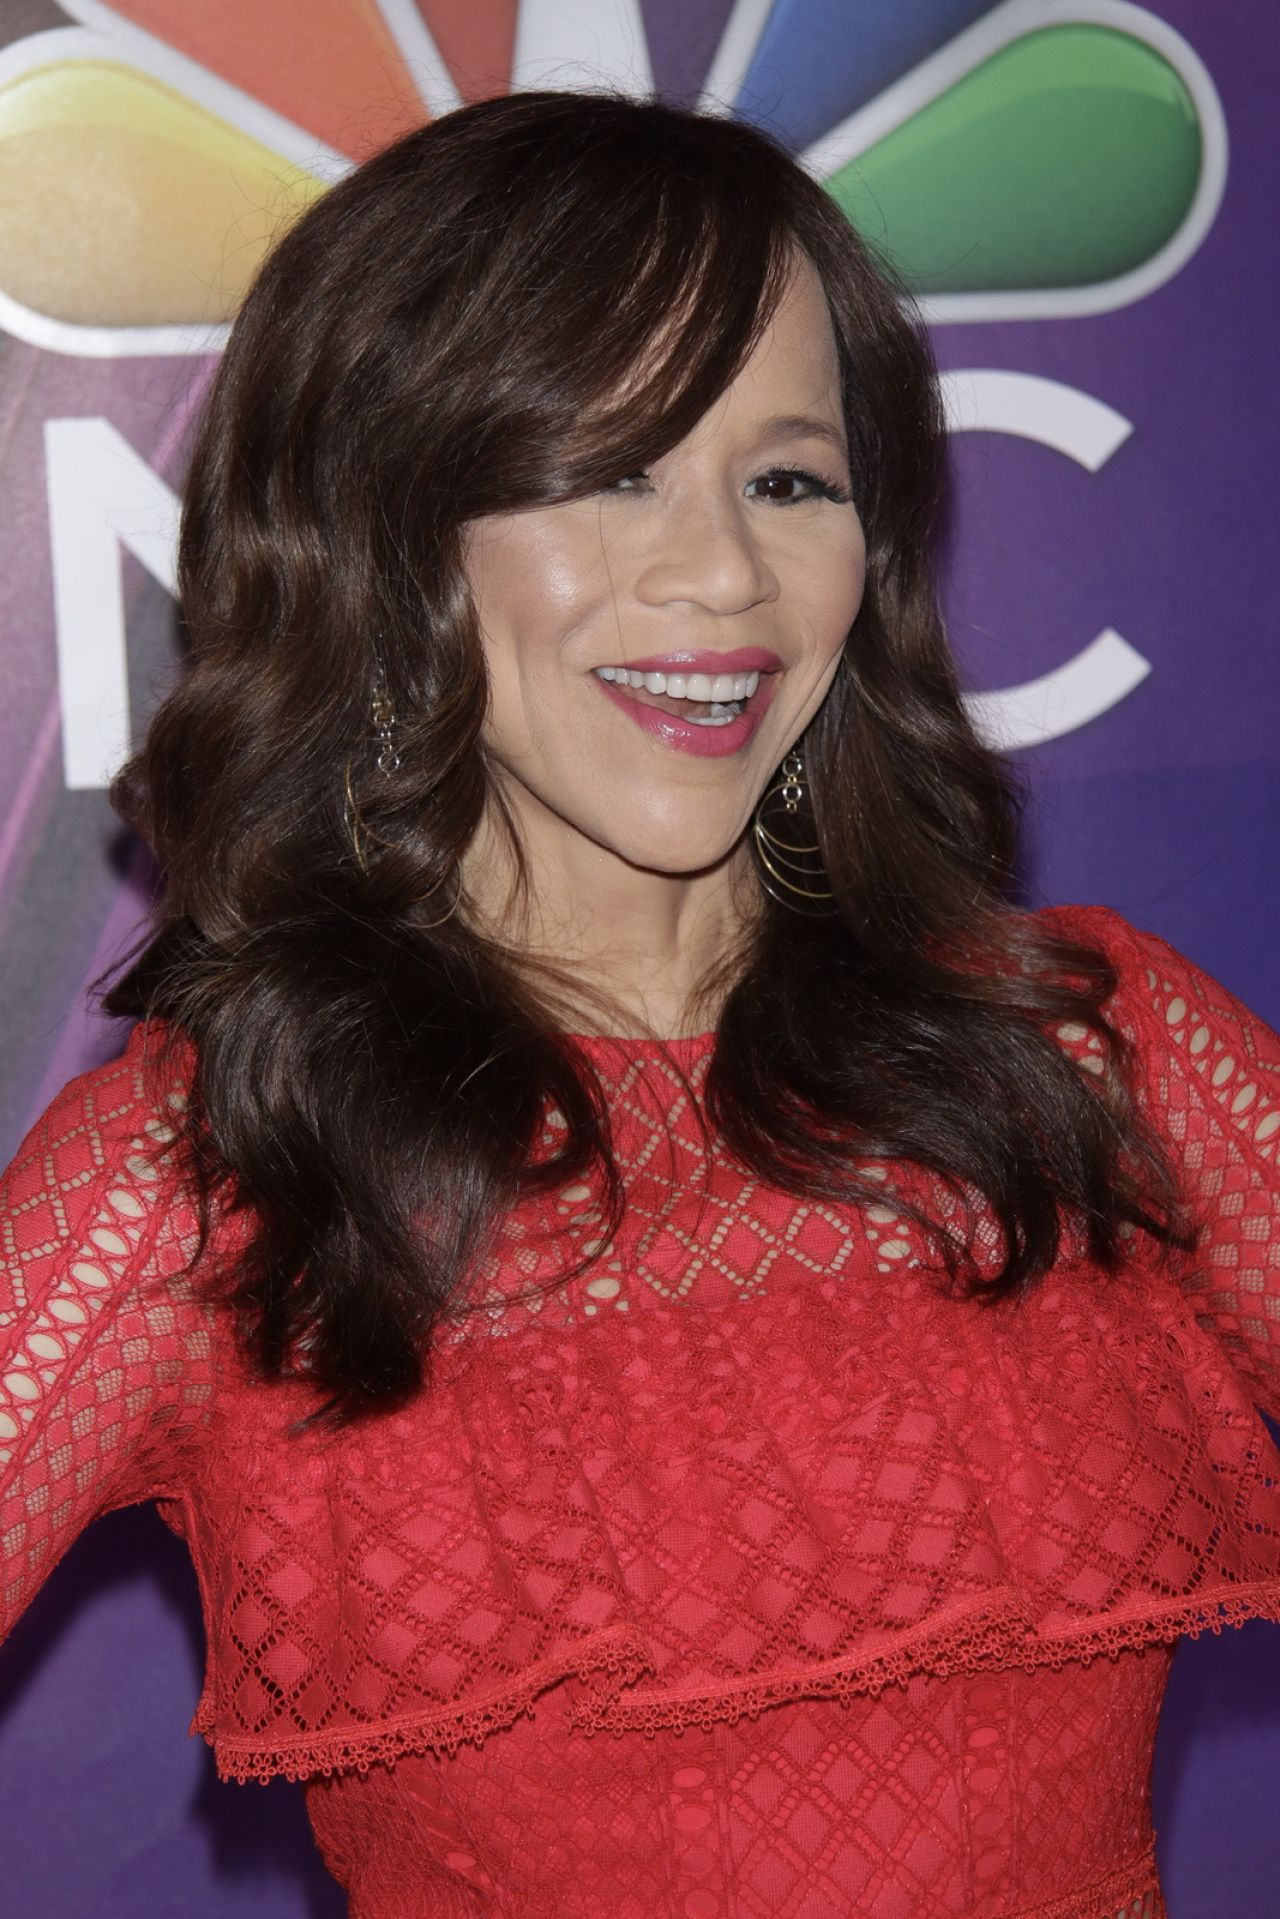 Rosie Perez Nbc Mid Season Press Day In New York 03 08 2018